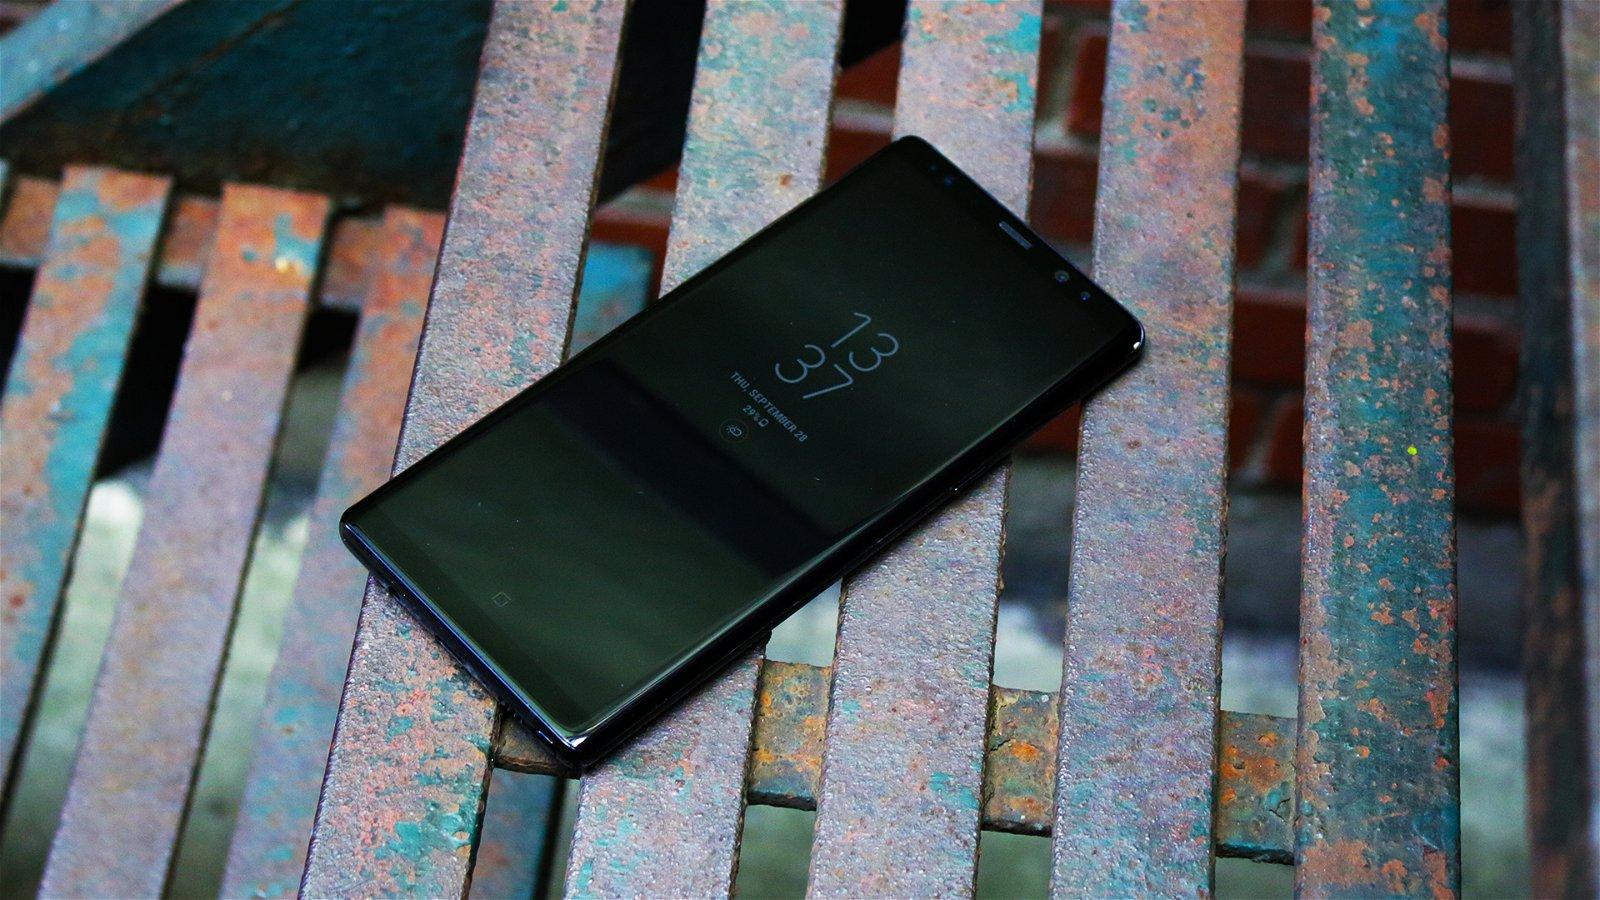 Samsung Galaxy Note 8 (Smartphone) - A Long Awaited Comeback 4